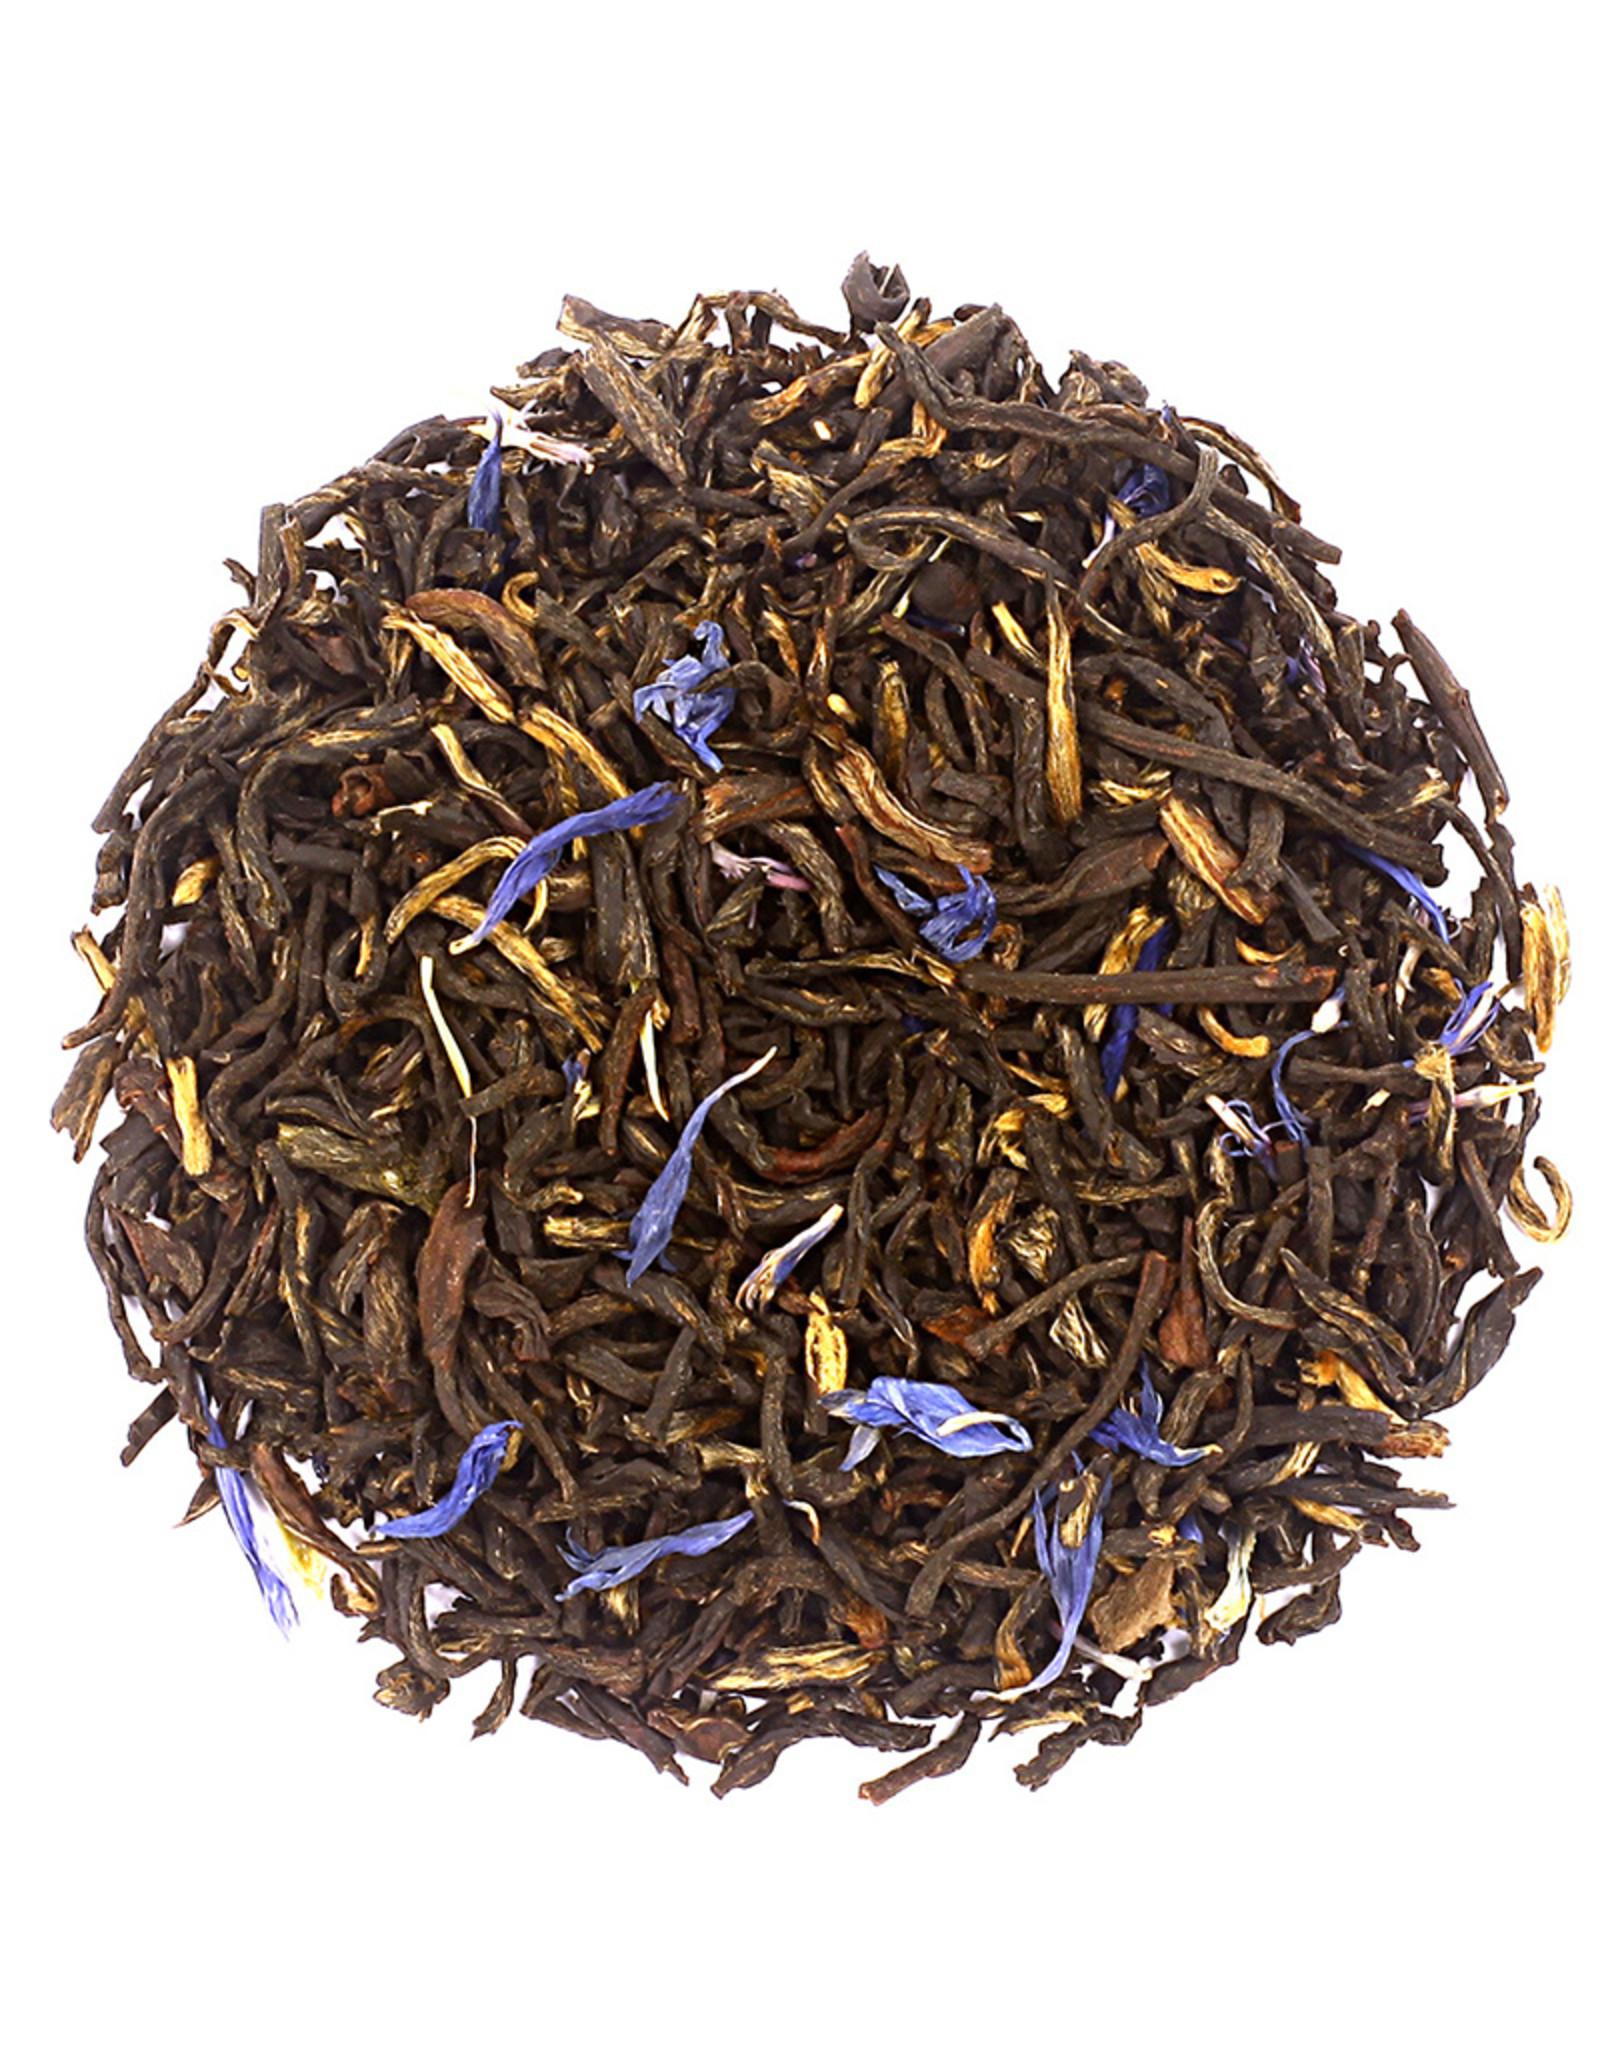 Or Tea? Yin Yang - Zwarte thee met koffiebonen